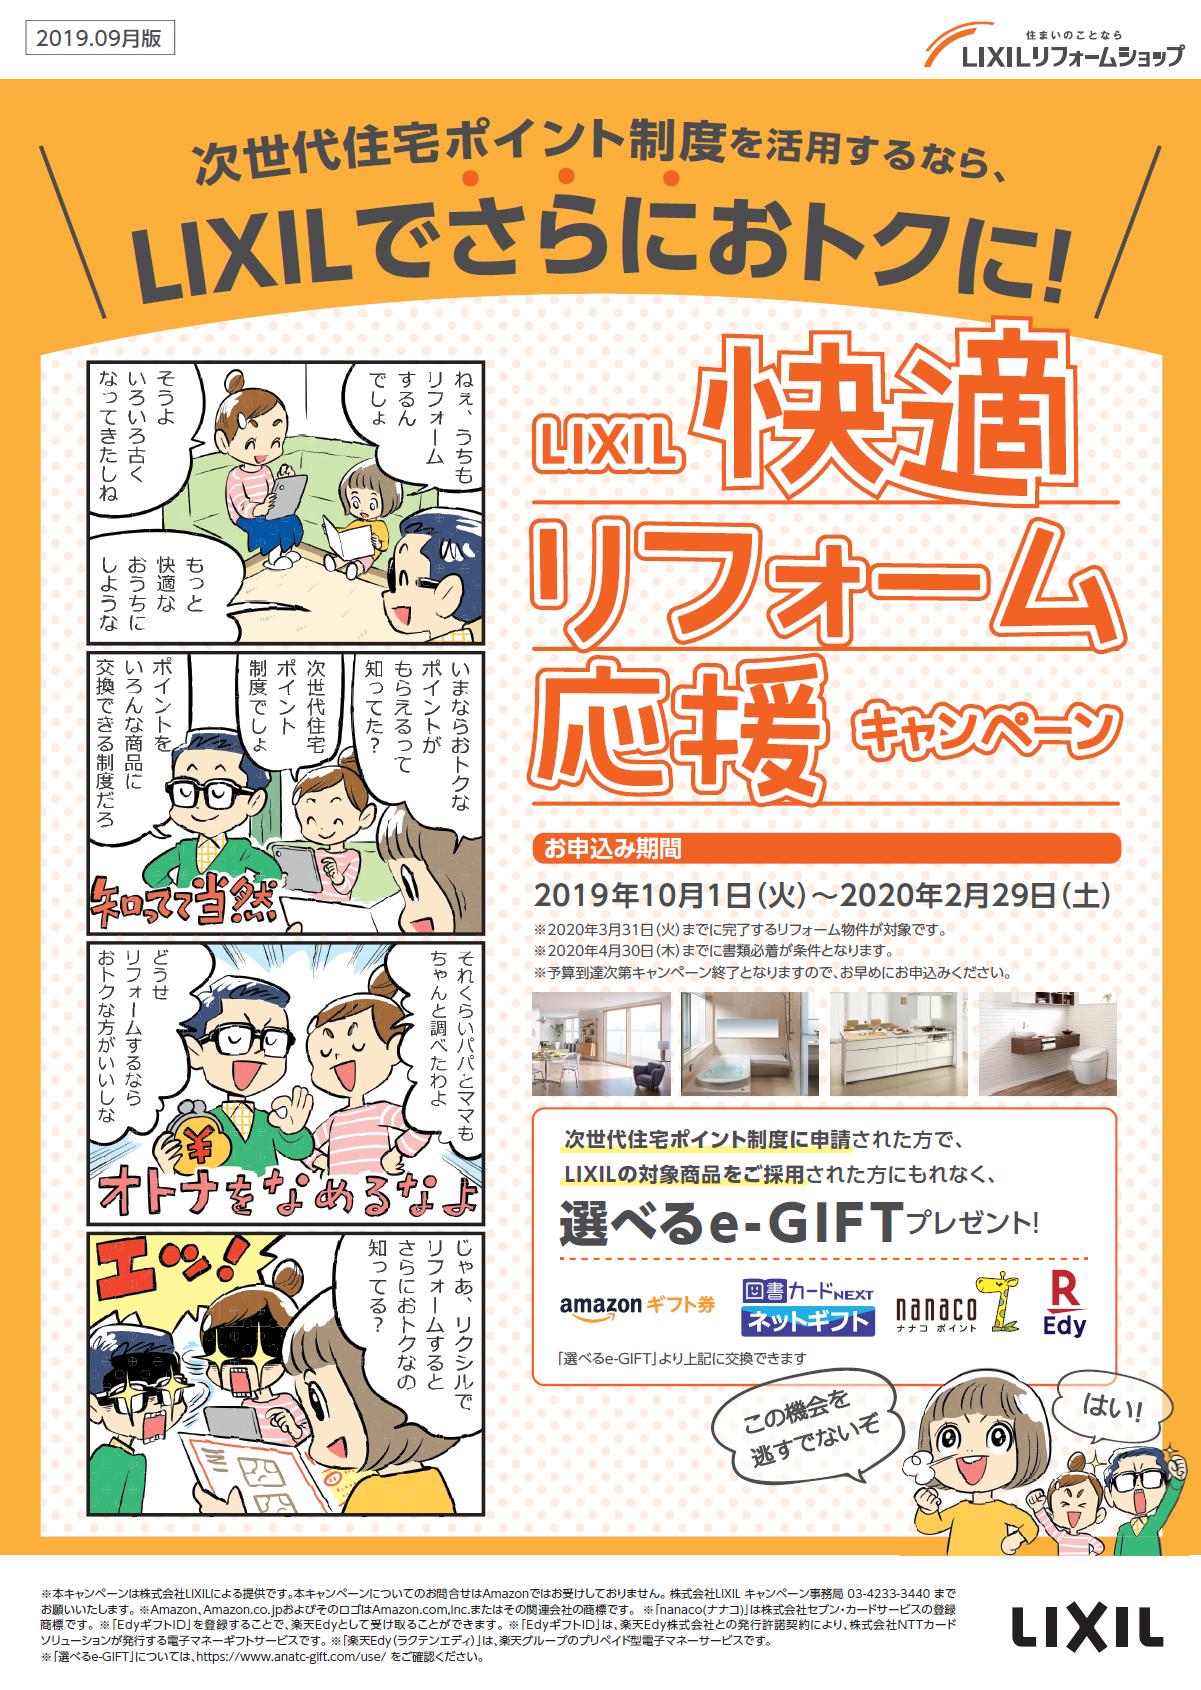 https://lixil-reformshop.jp/shop/SC00111008/photos/1e3e9e8122854b3c6d149a46380022061dad9cf1.png